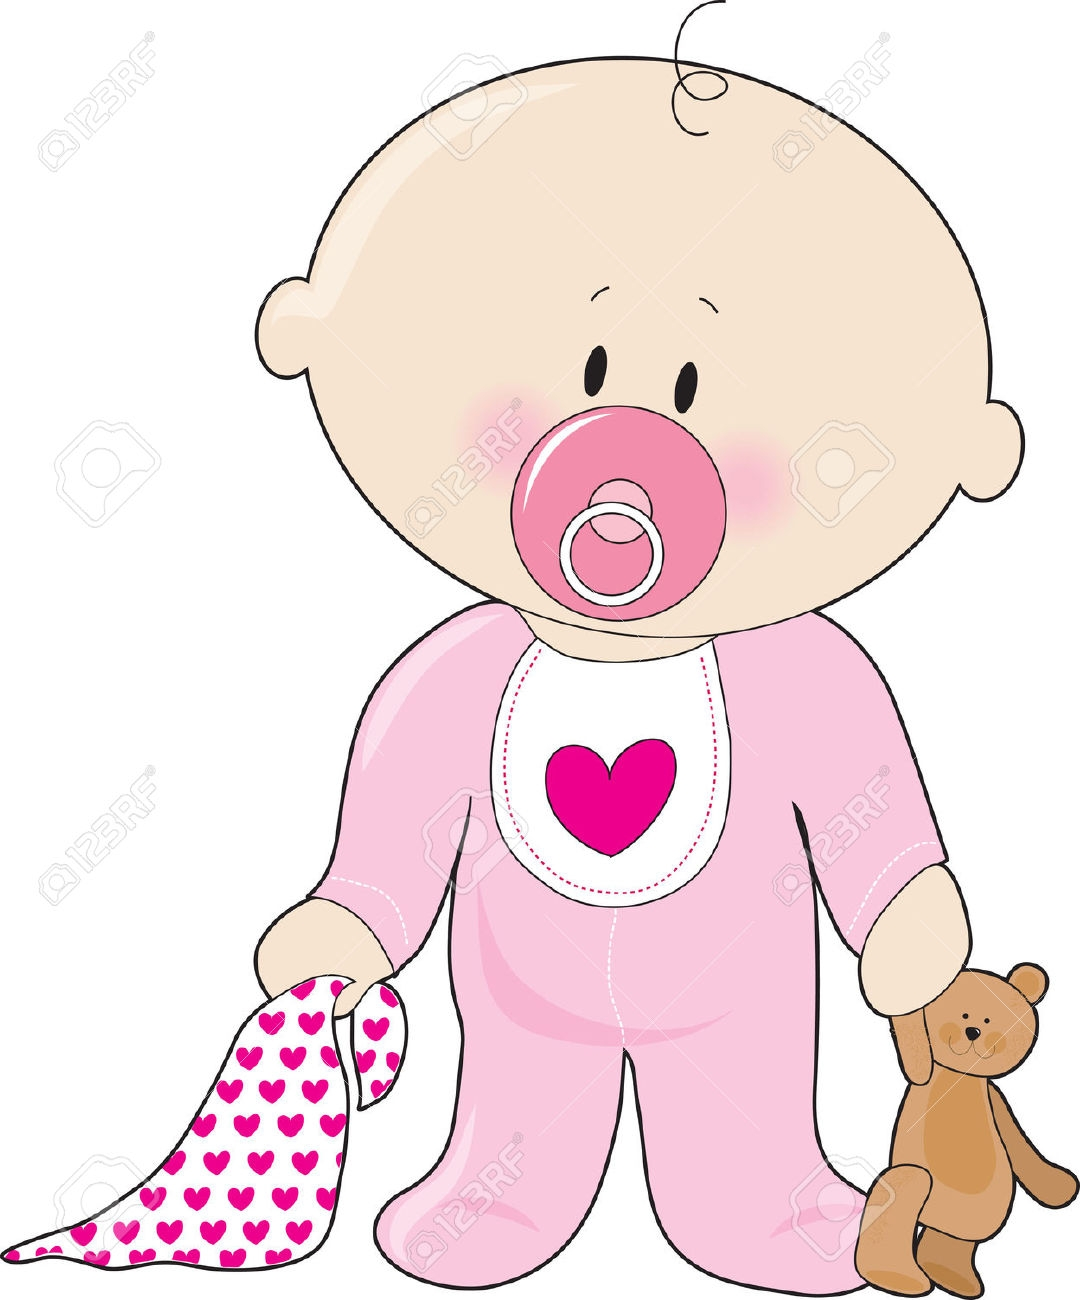 clipart baby girl-clipart baby girl-6